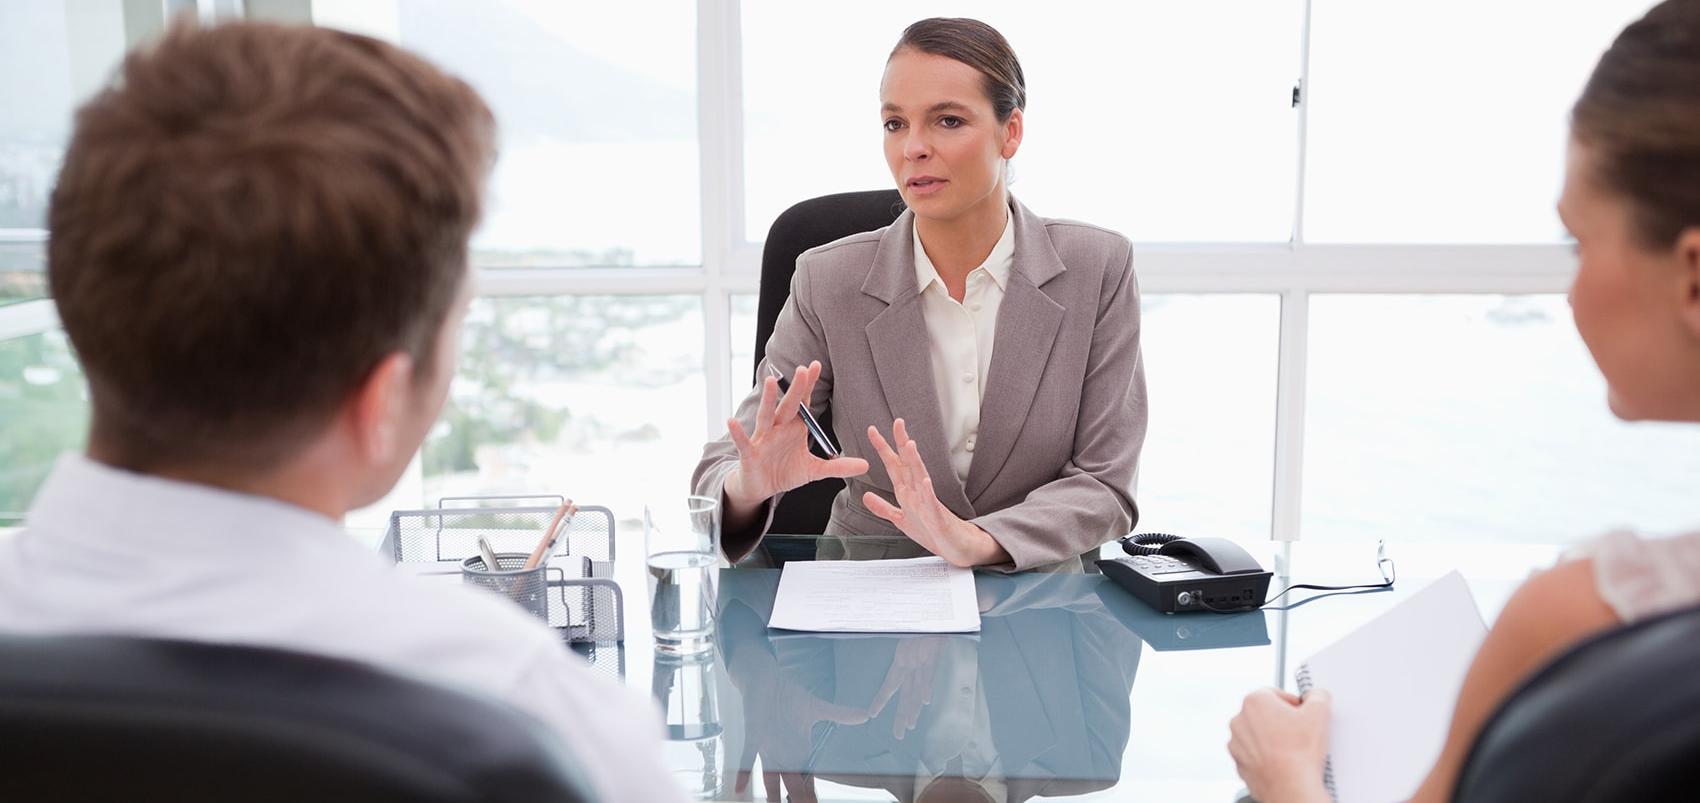 консультация юриста по госзакупкам